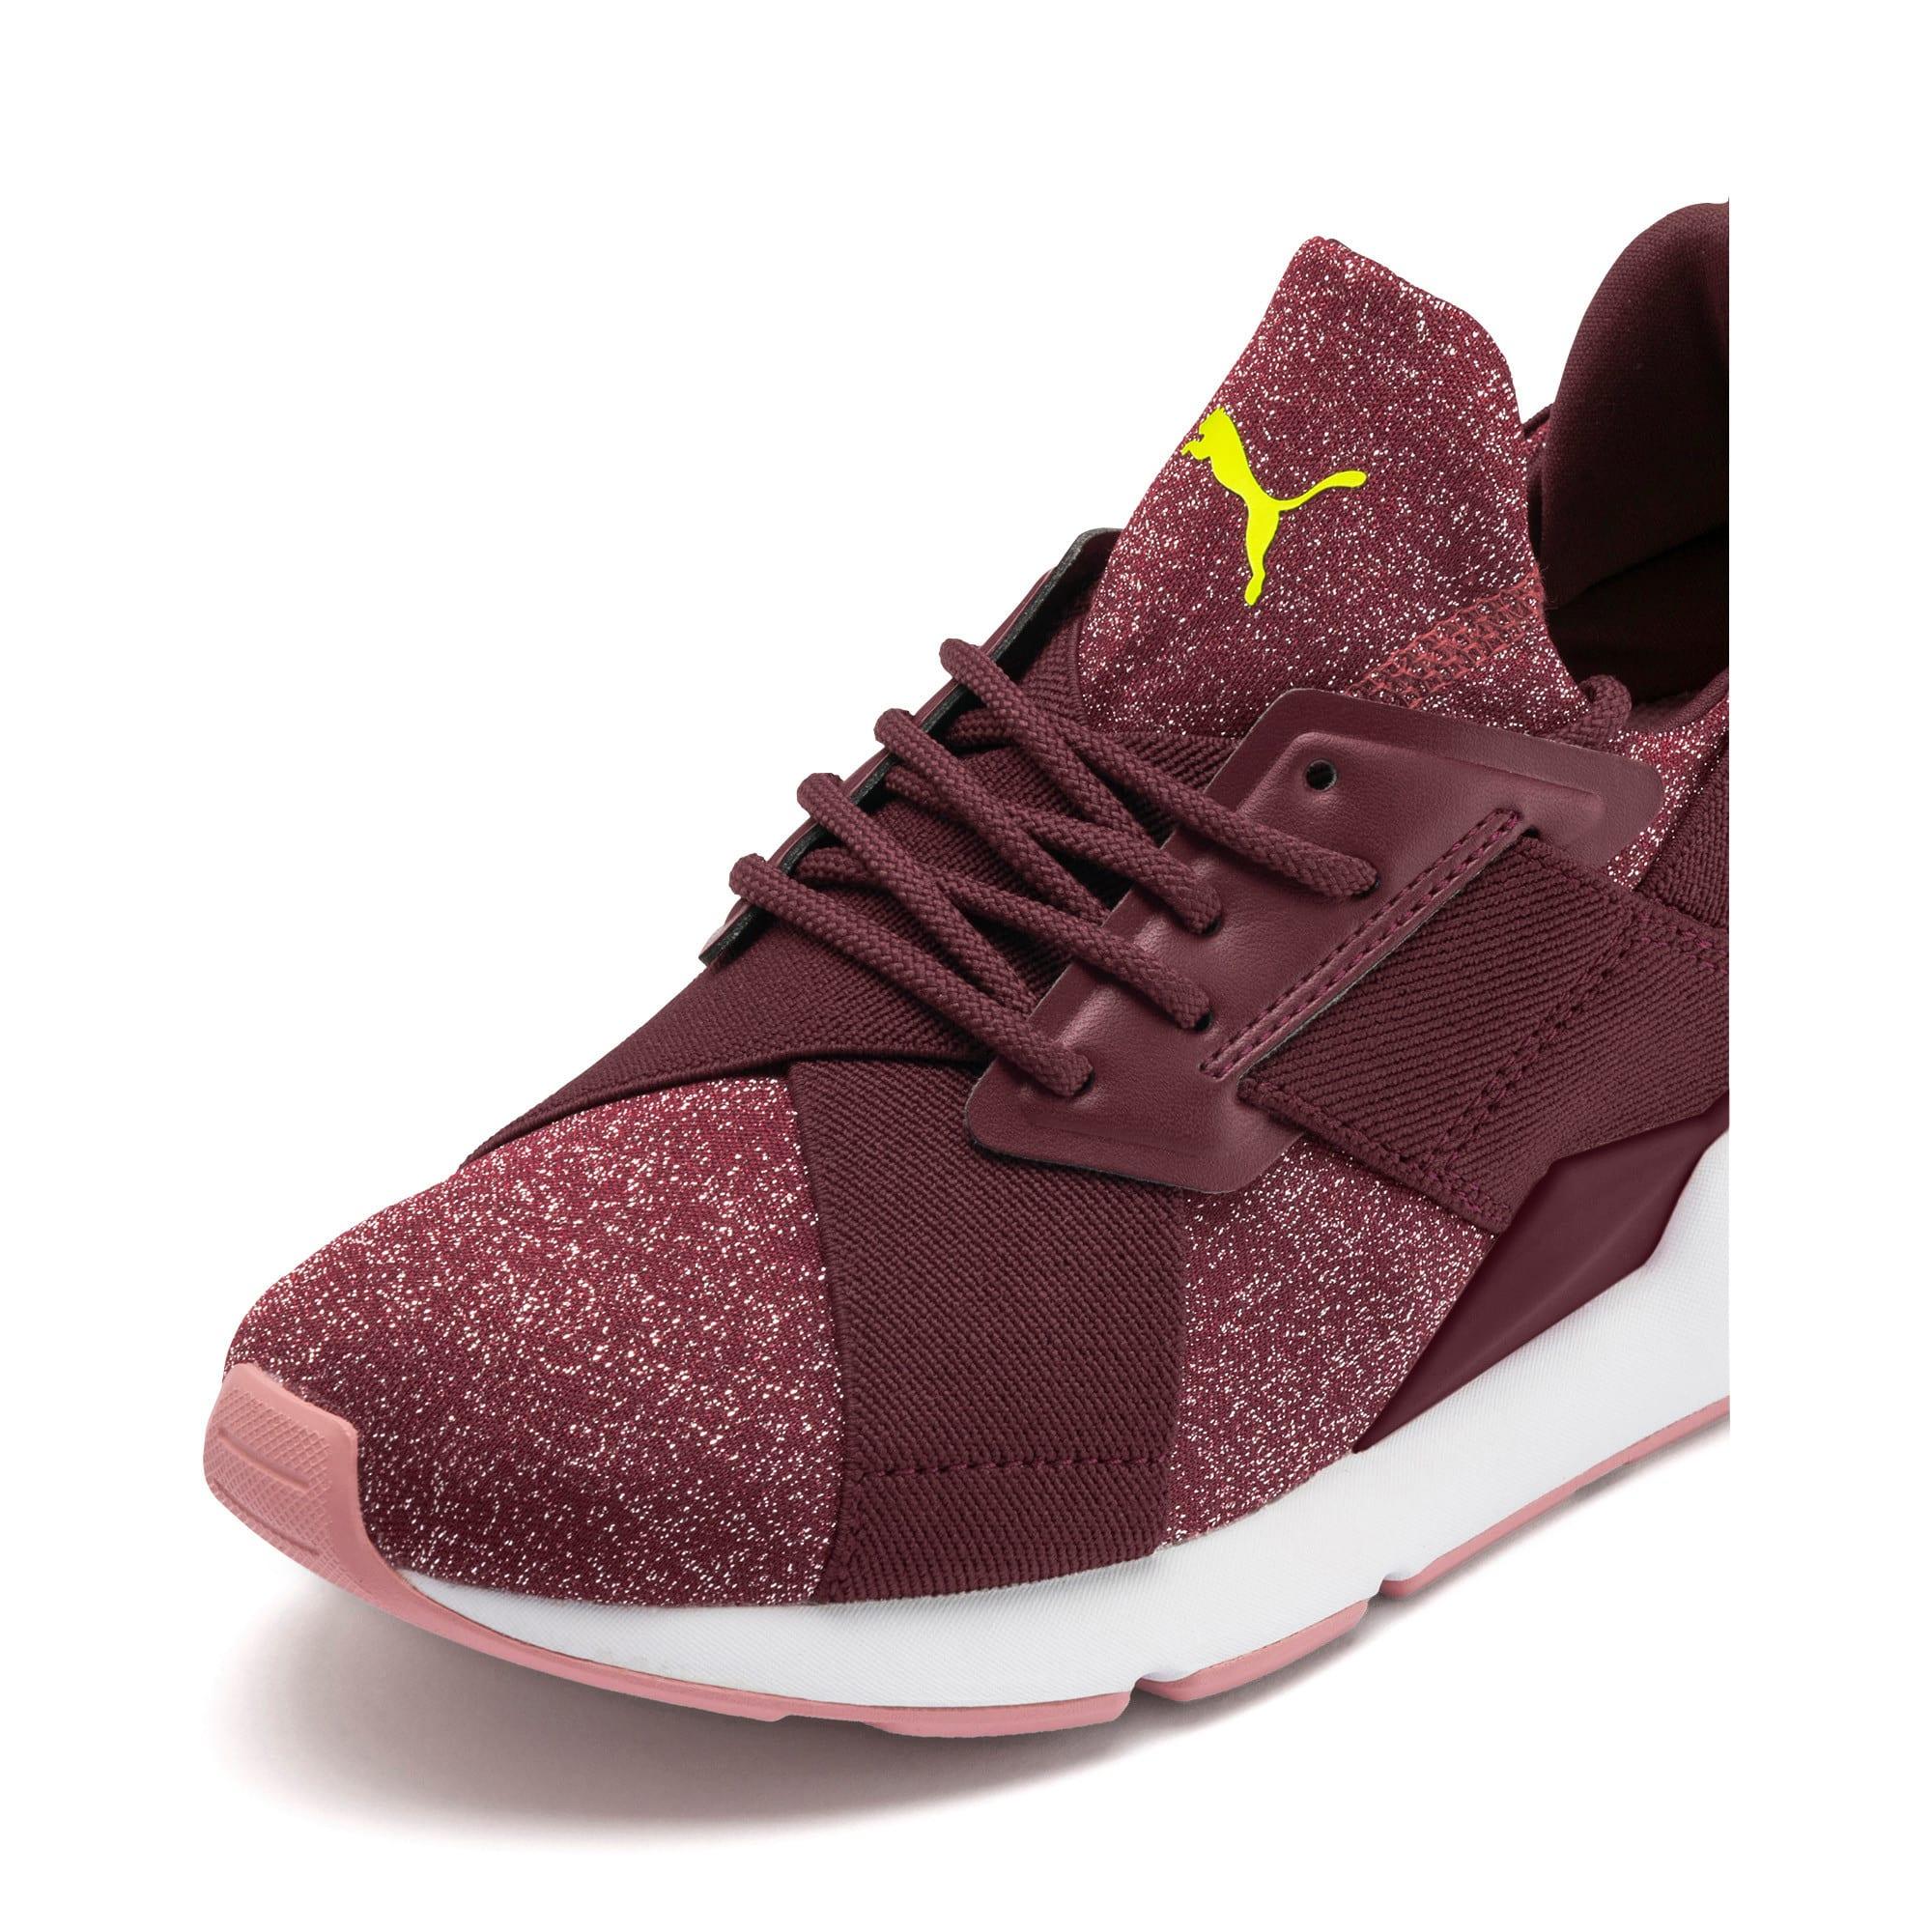 Thumbnail 7 of Muse Shift Sneakers JR, Vineyard Wine-Yellow Alert, medium